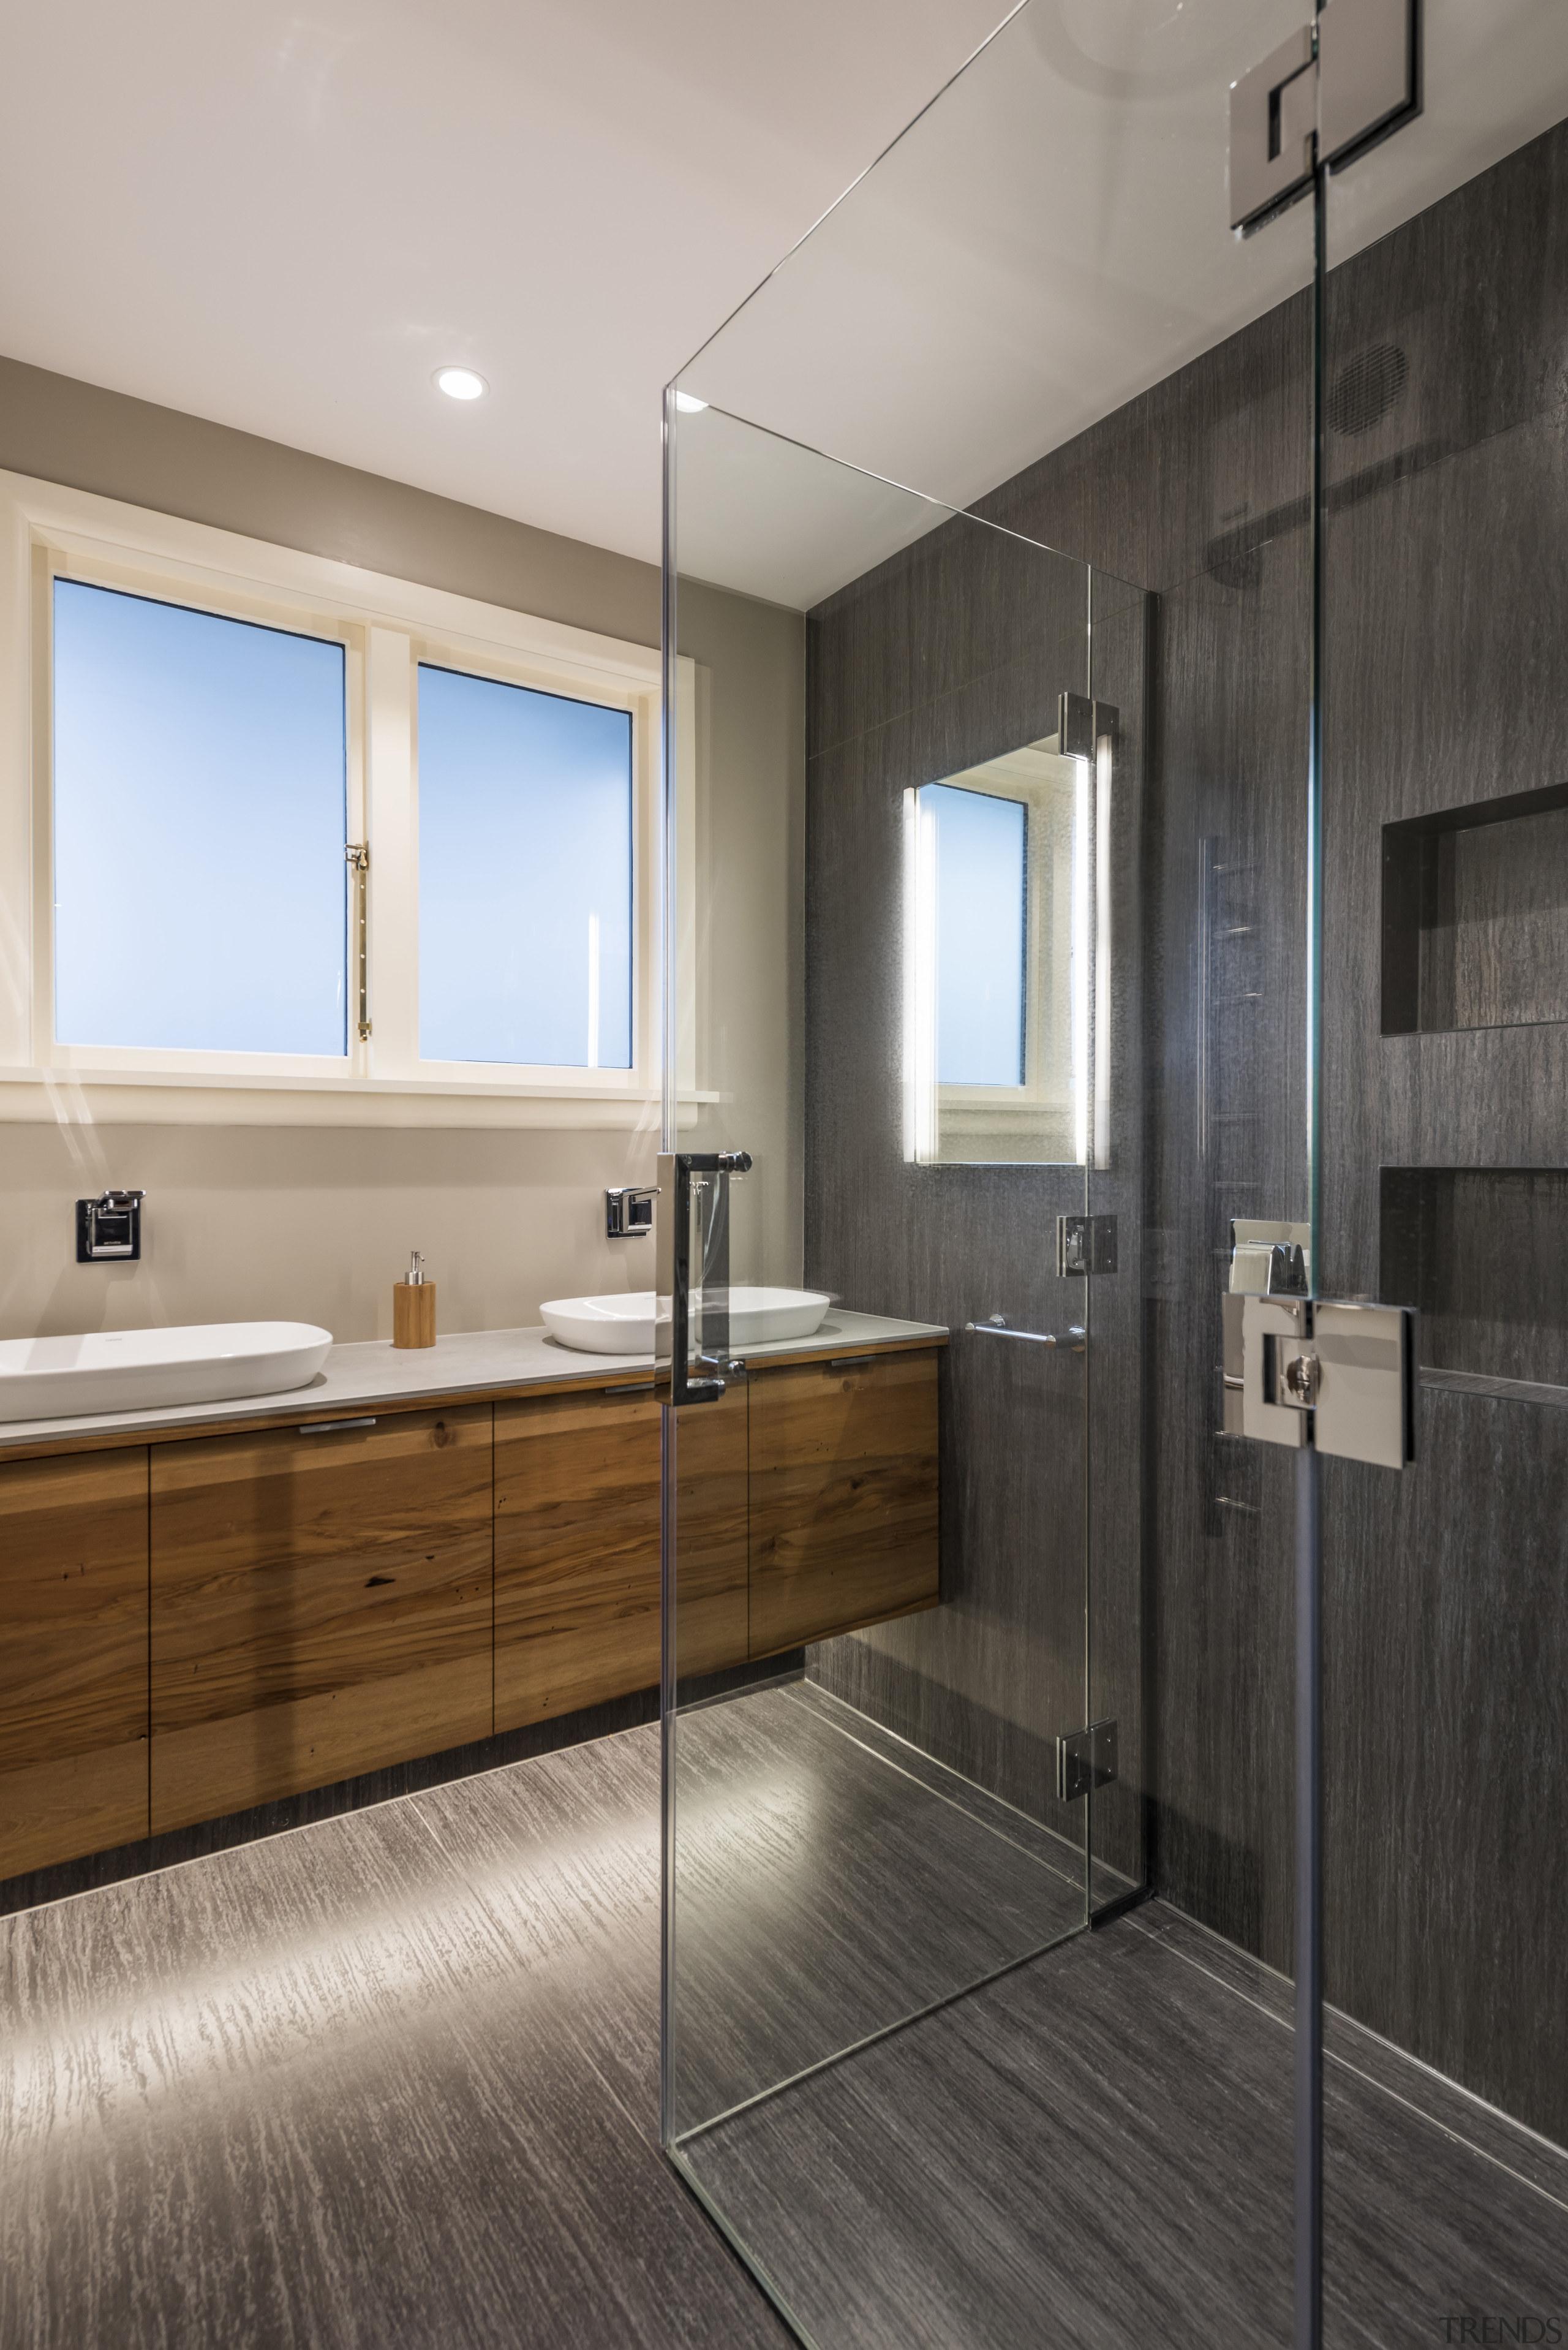 When in use, the shower looks like a bathroom, floor, flooring, interior design, basin, tile, shower, CDK Stone, Caroma, methven, Higham architects